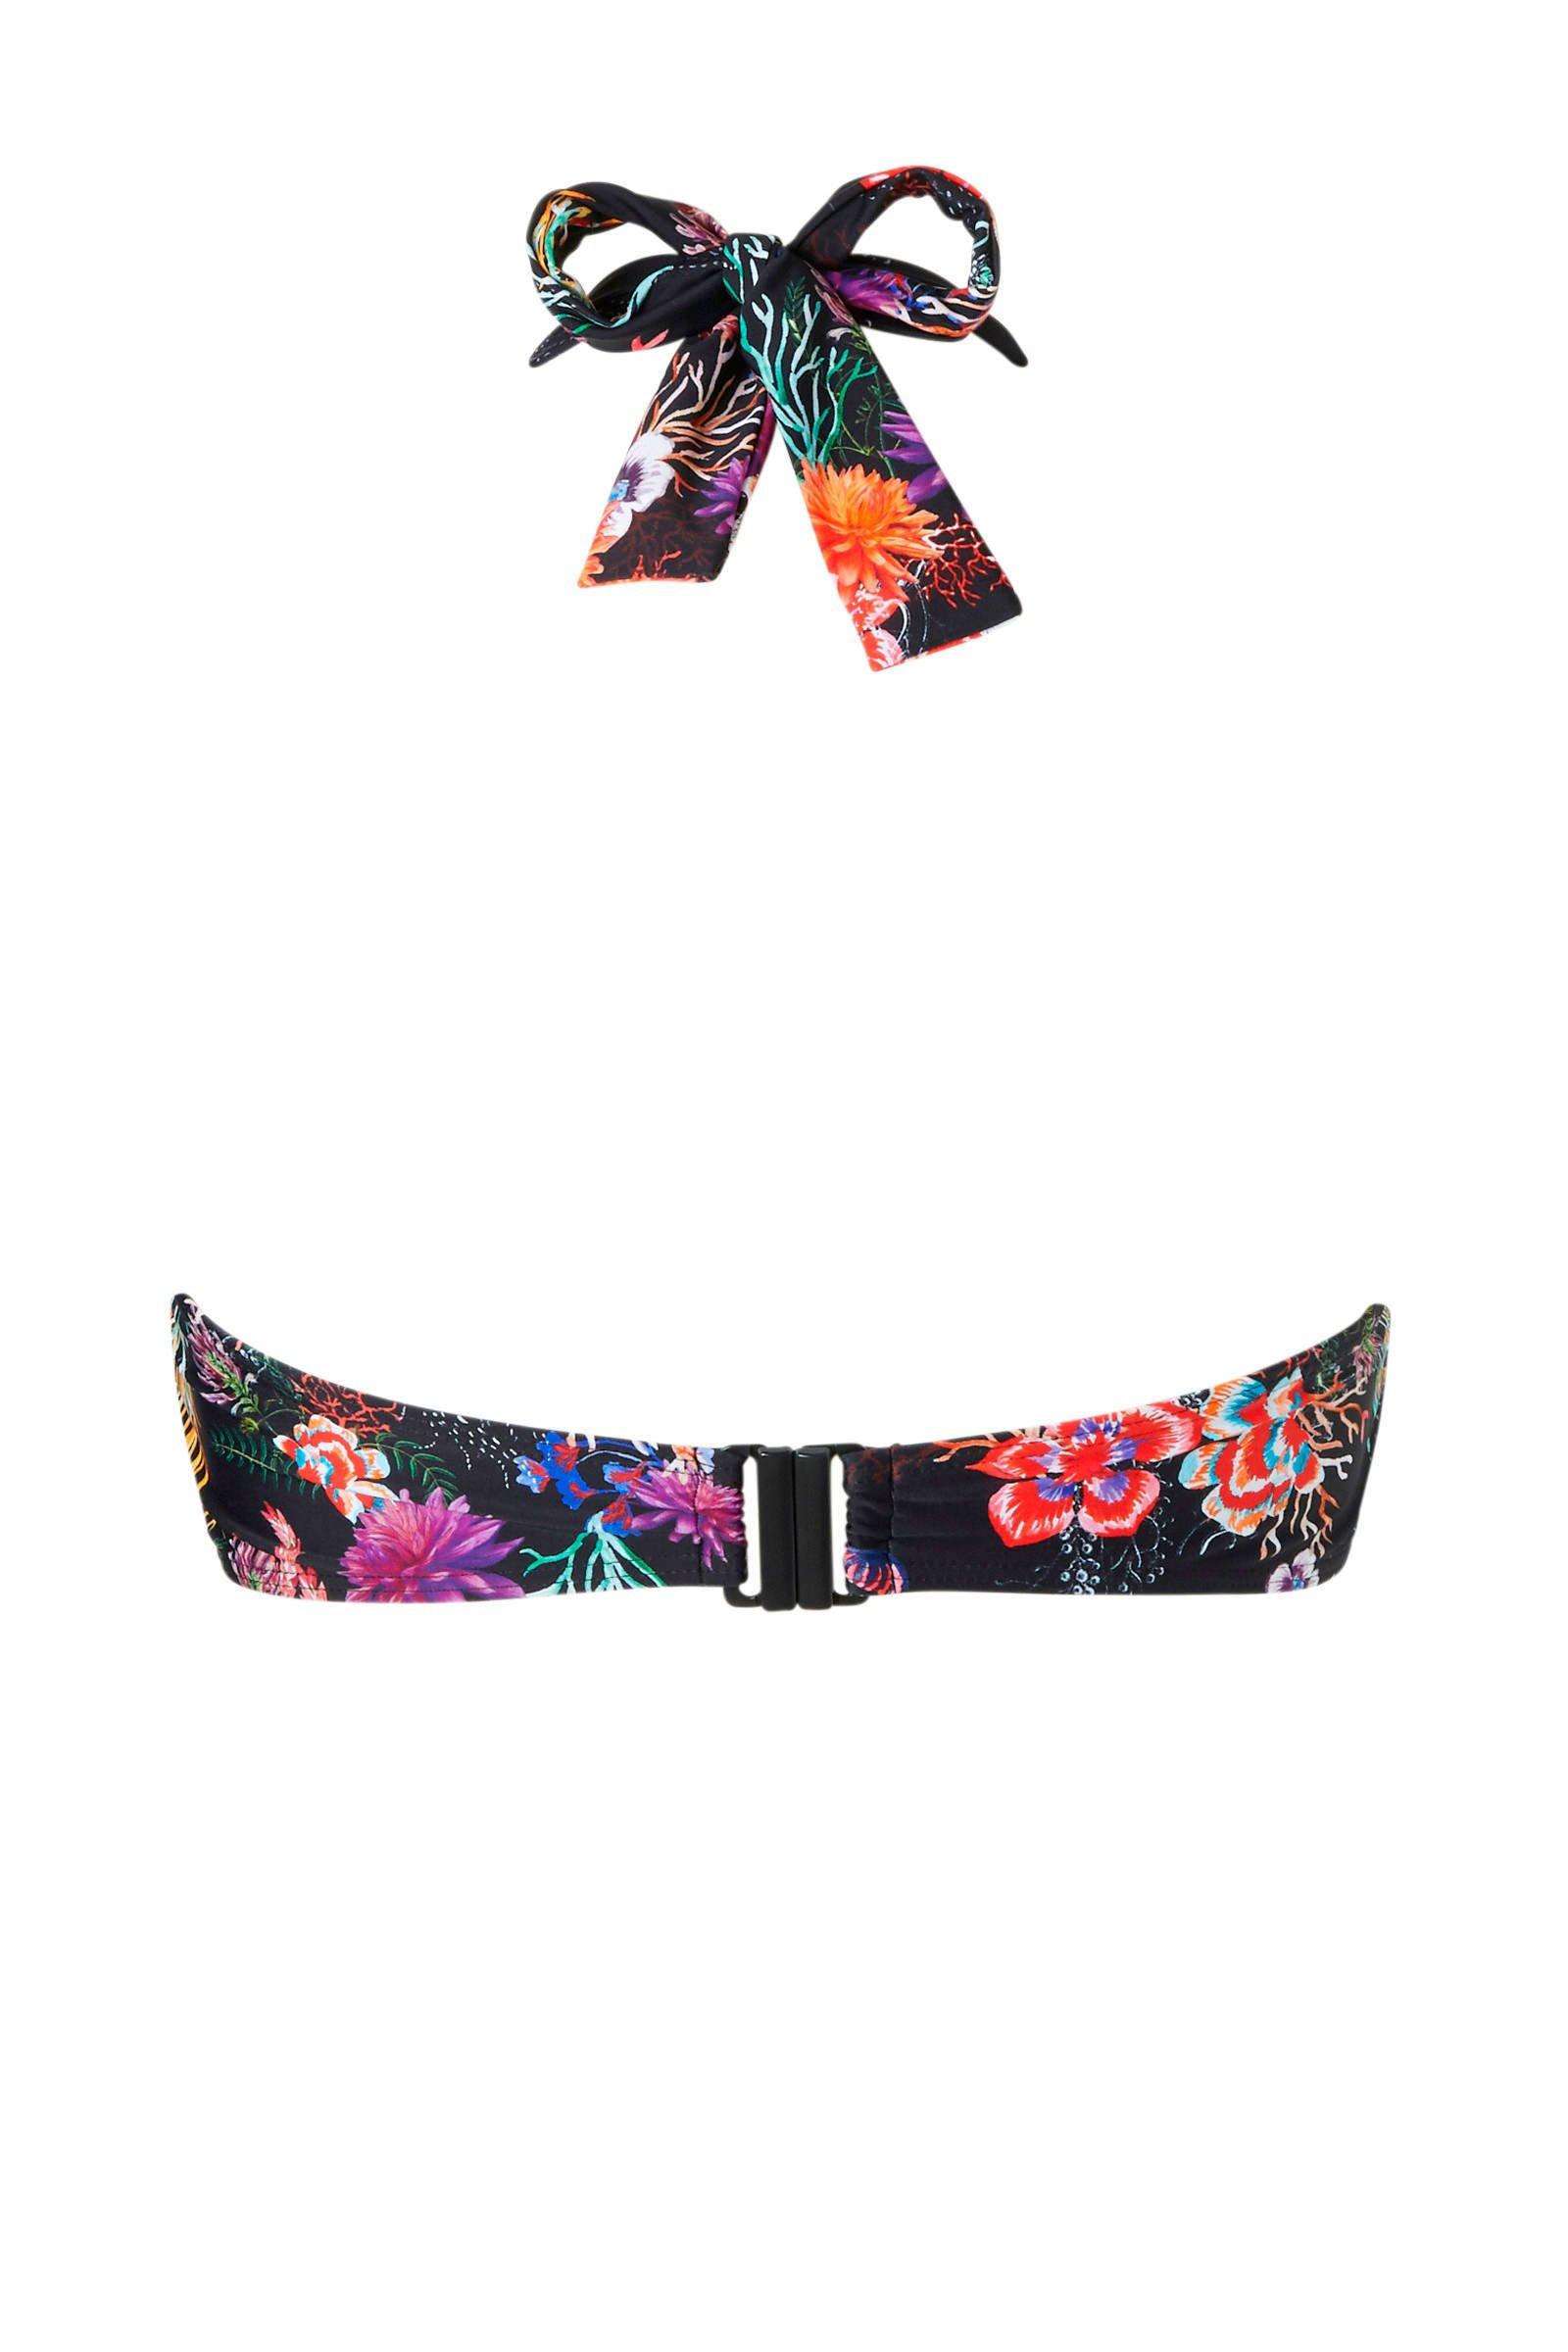 JUNAROSE halter halter bikinitop met bloemenprint JUNAROSE 0PqE67